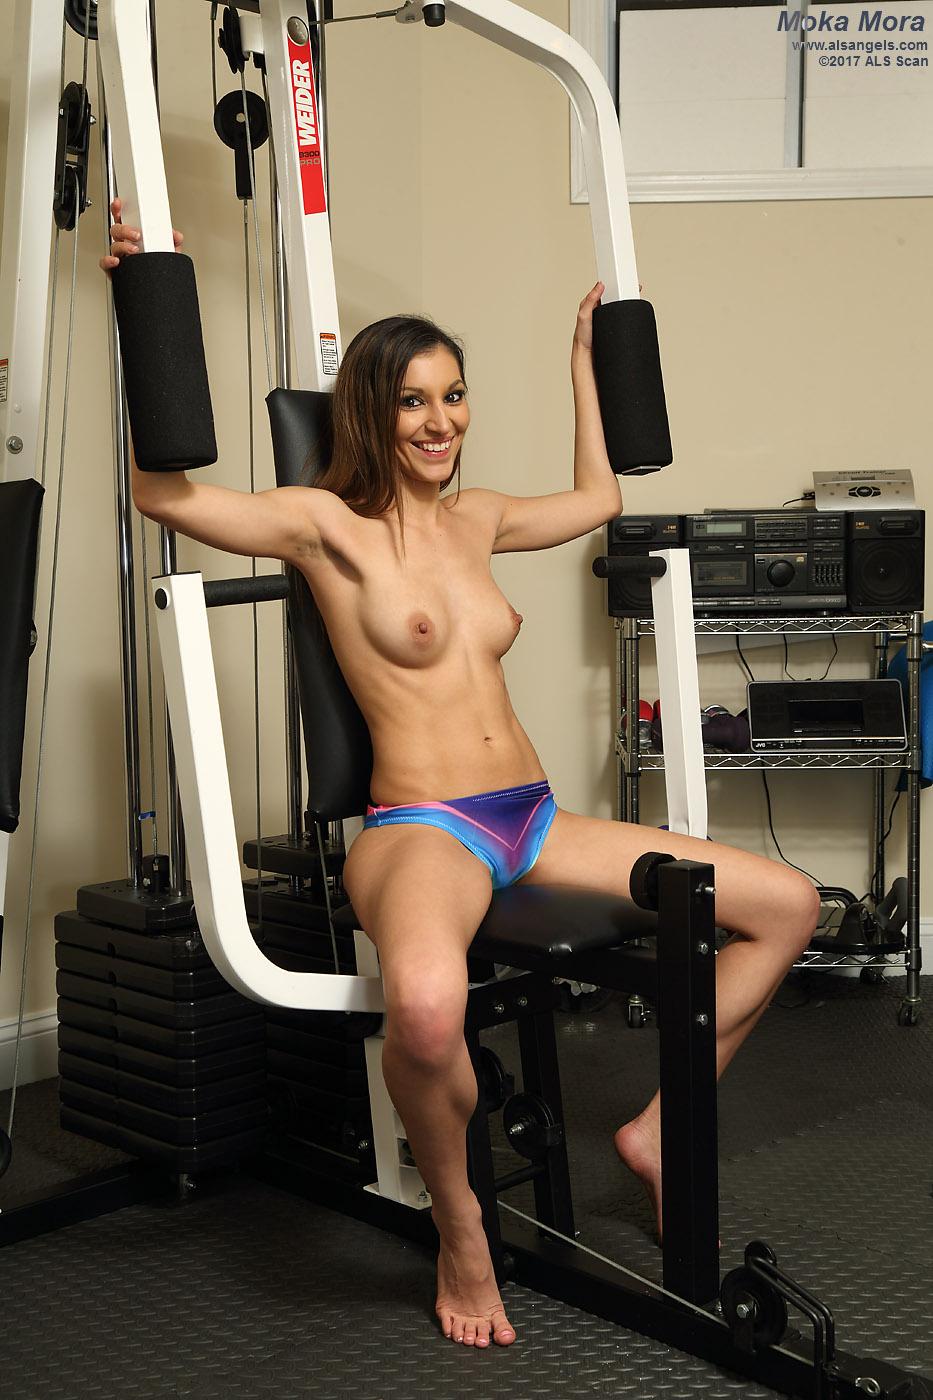 Hot Gym Girl